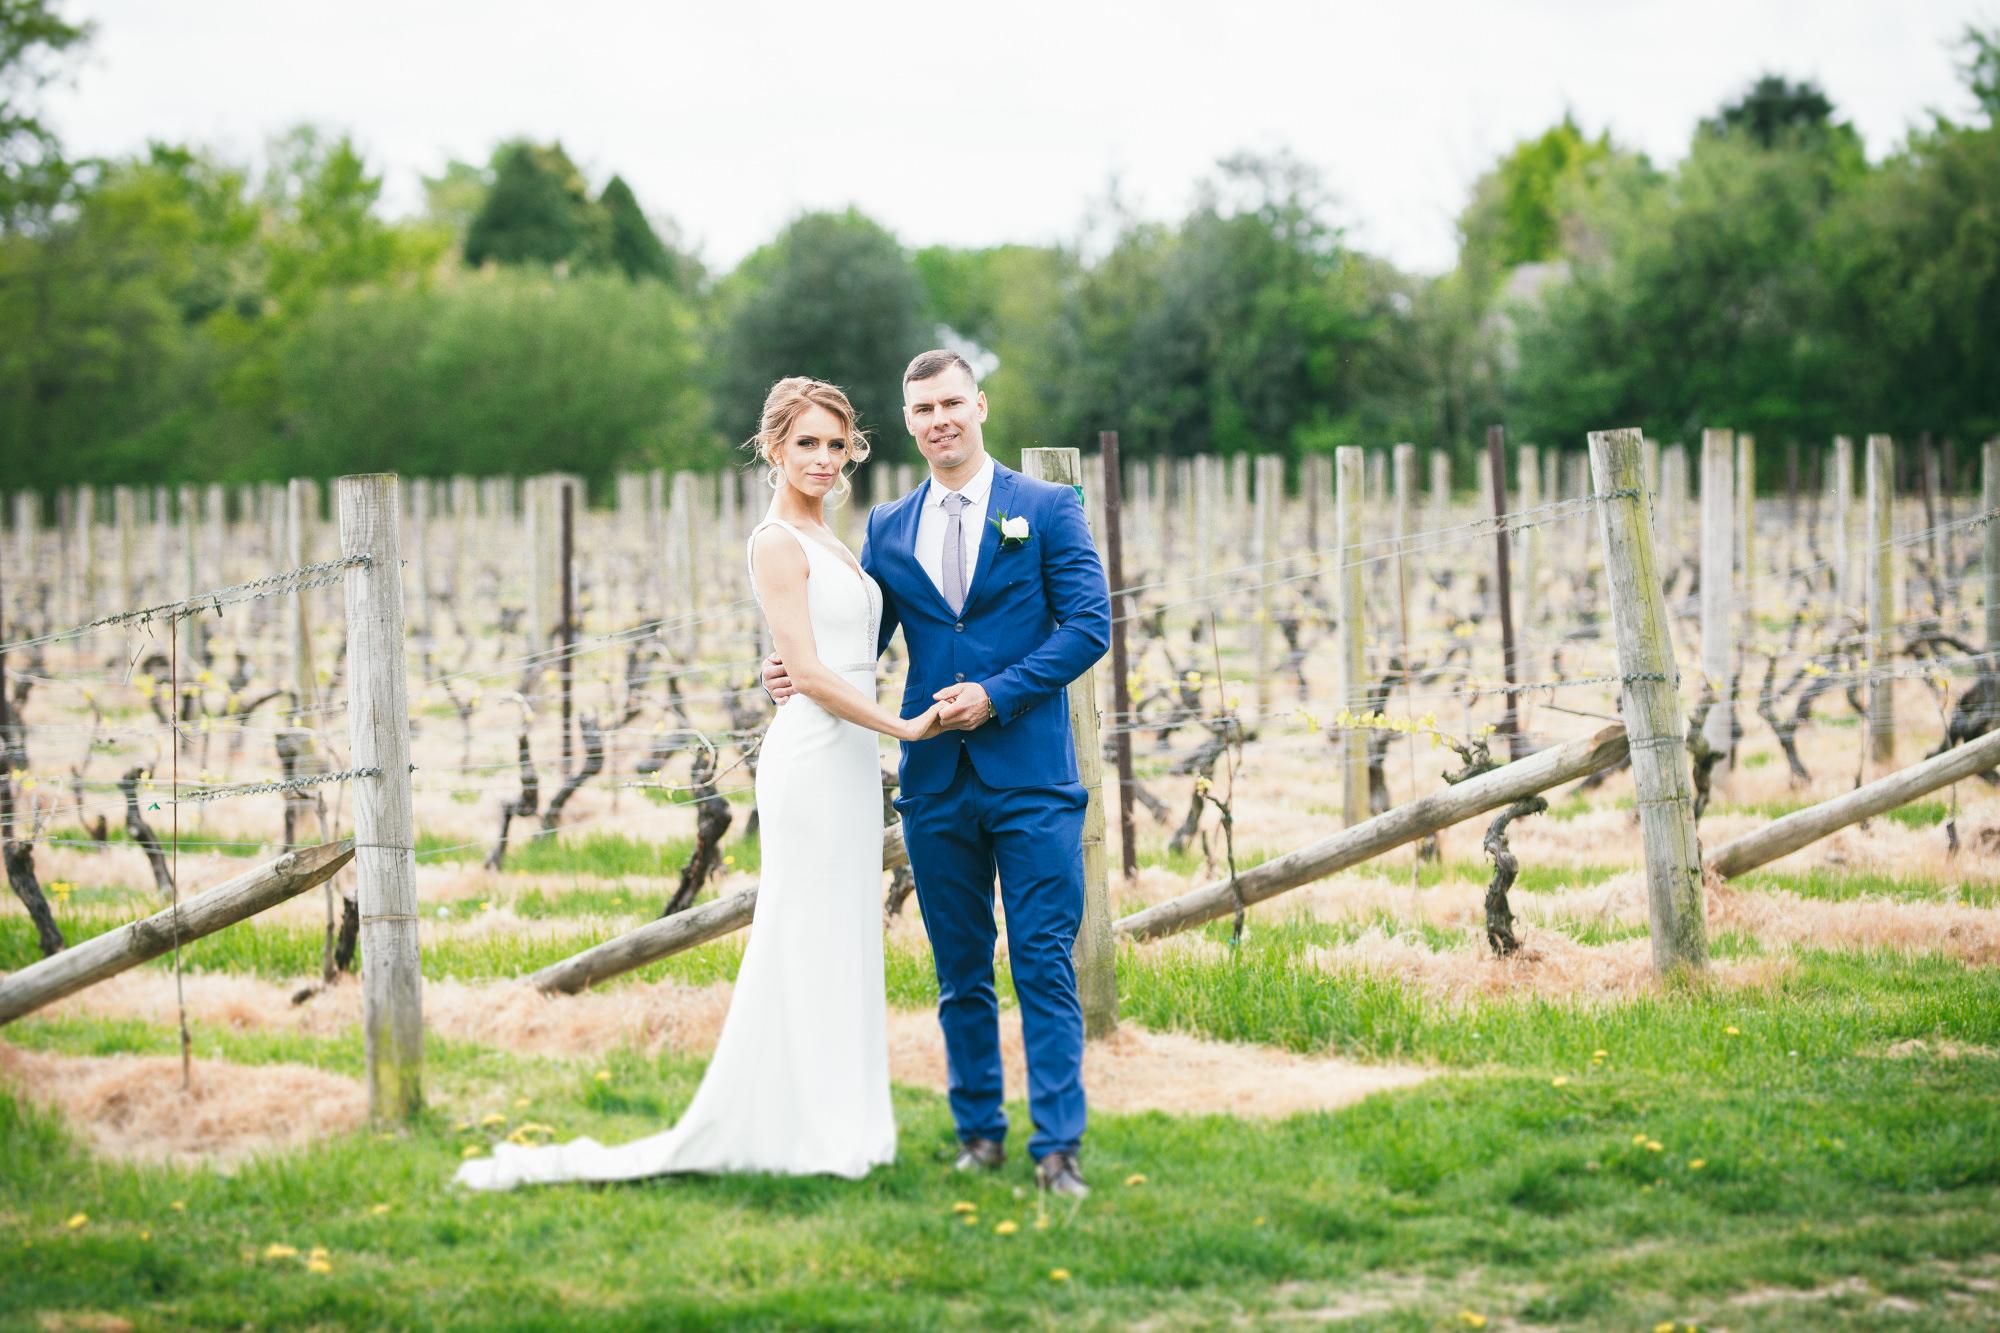 Bride and Groom Wedding Portrait under the tree near Nyetimber Vineyards Sussex